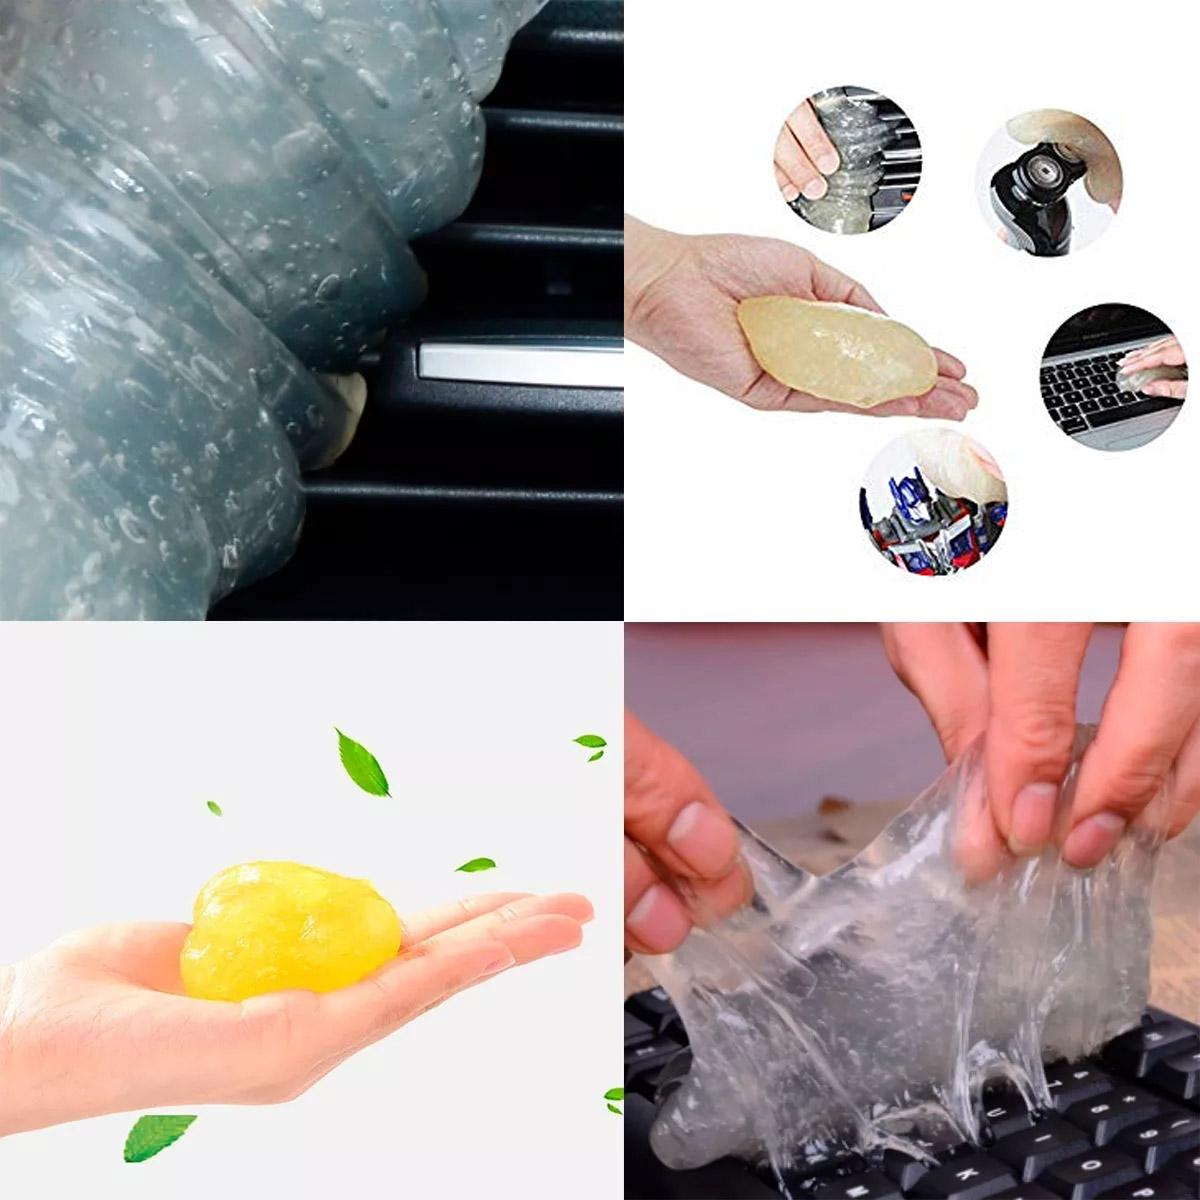 Gel Limpiador Slime Para Carros Celular Teclados No Grasoso